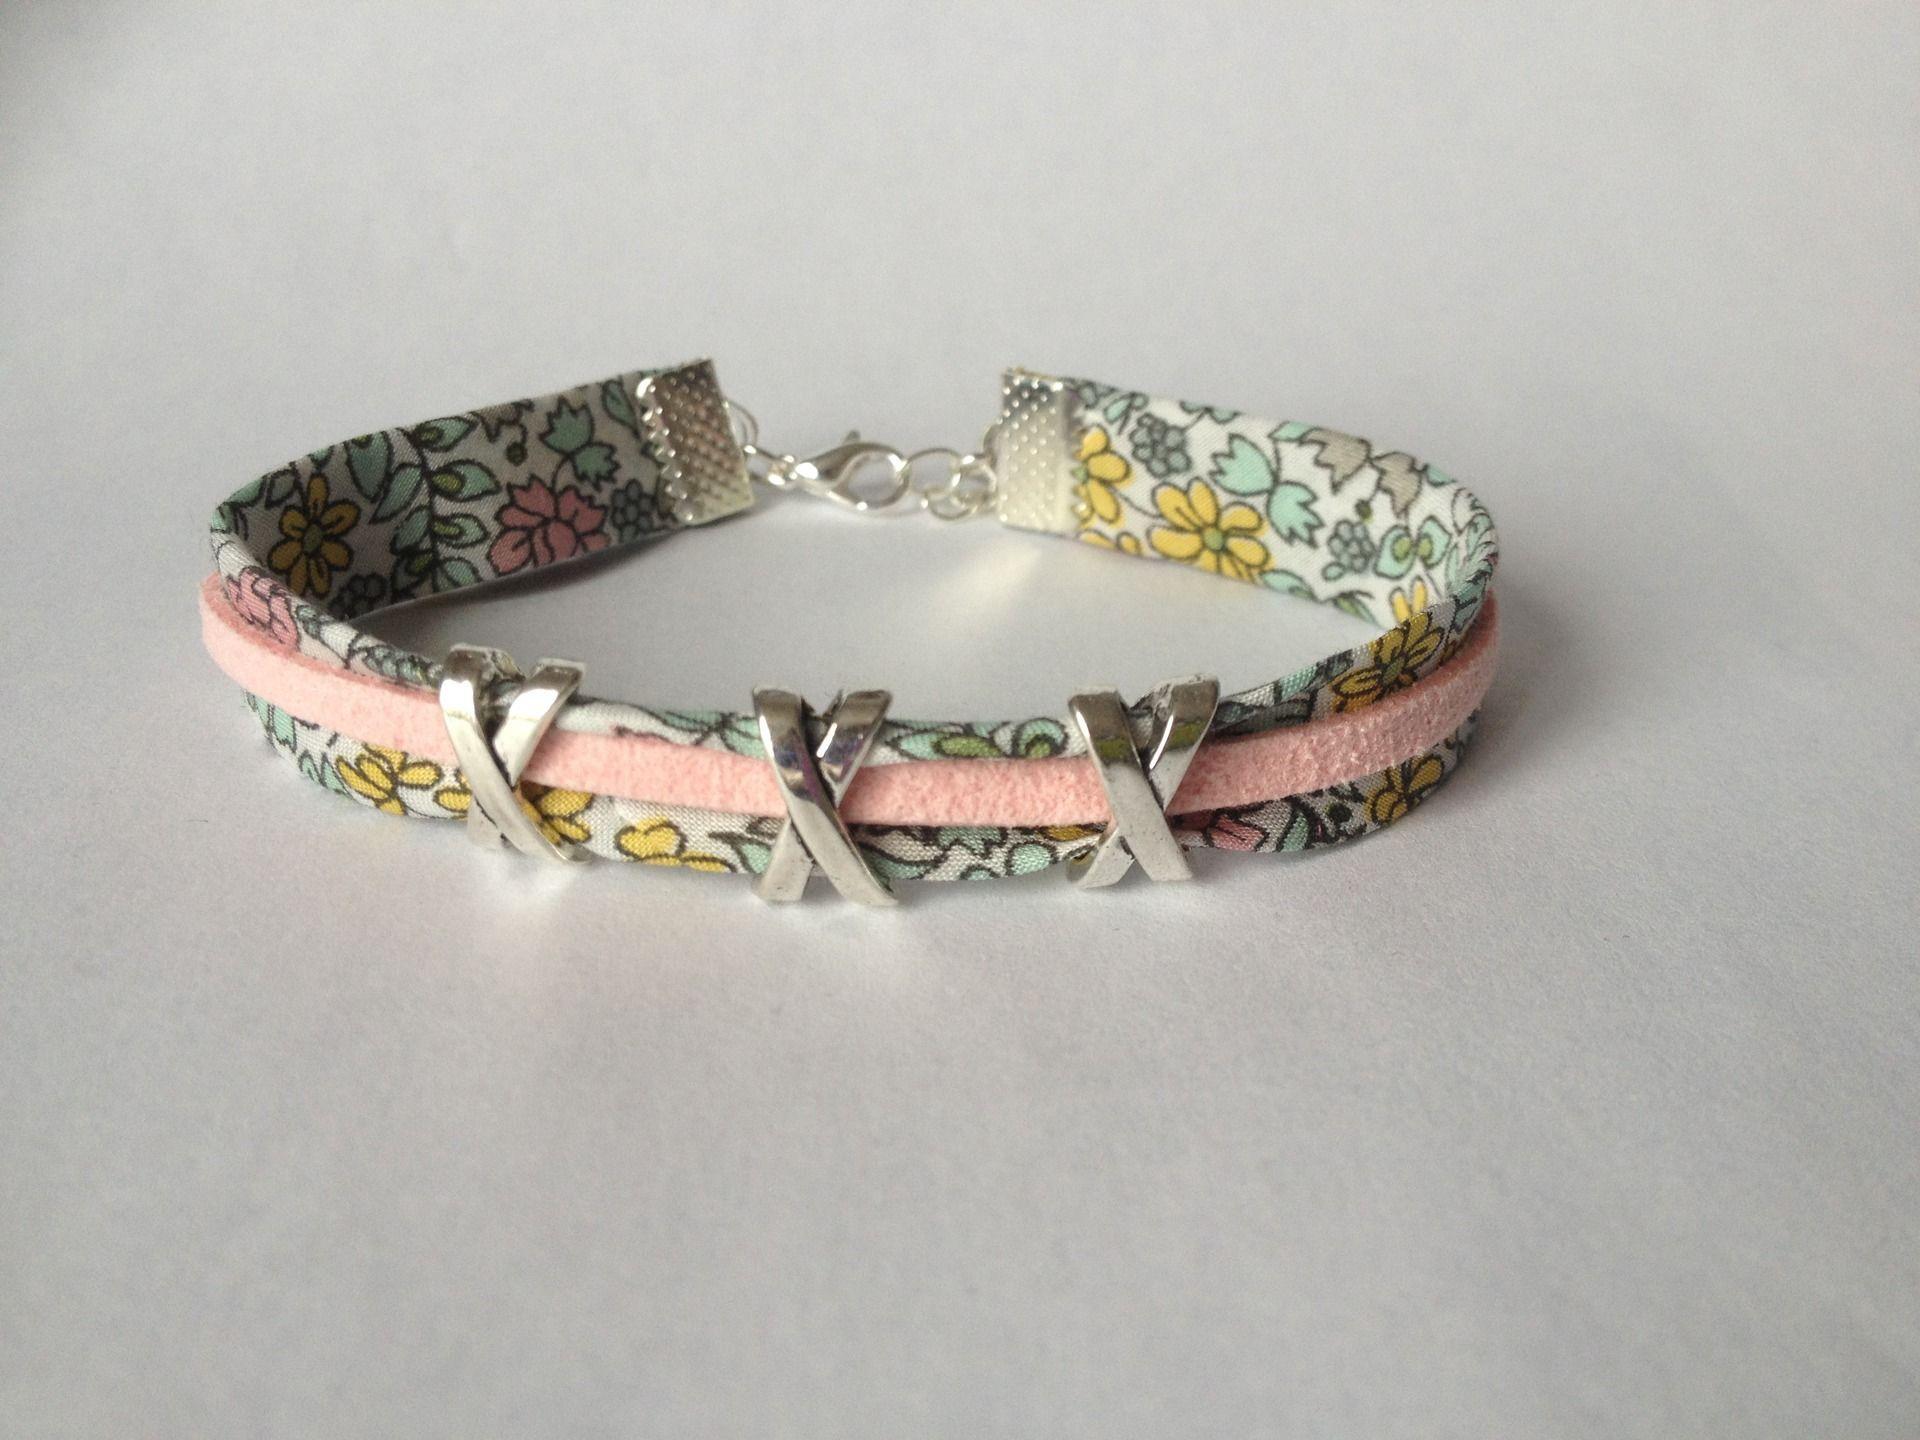 Bracelet en forme de fleur